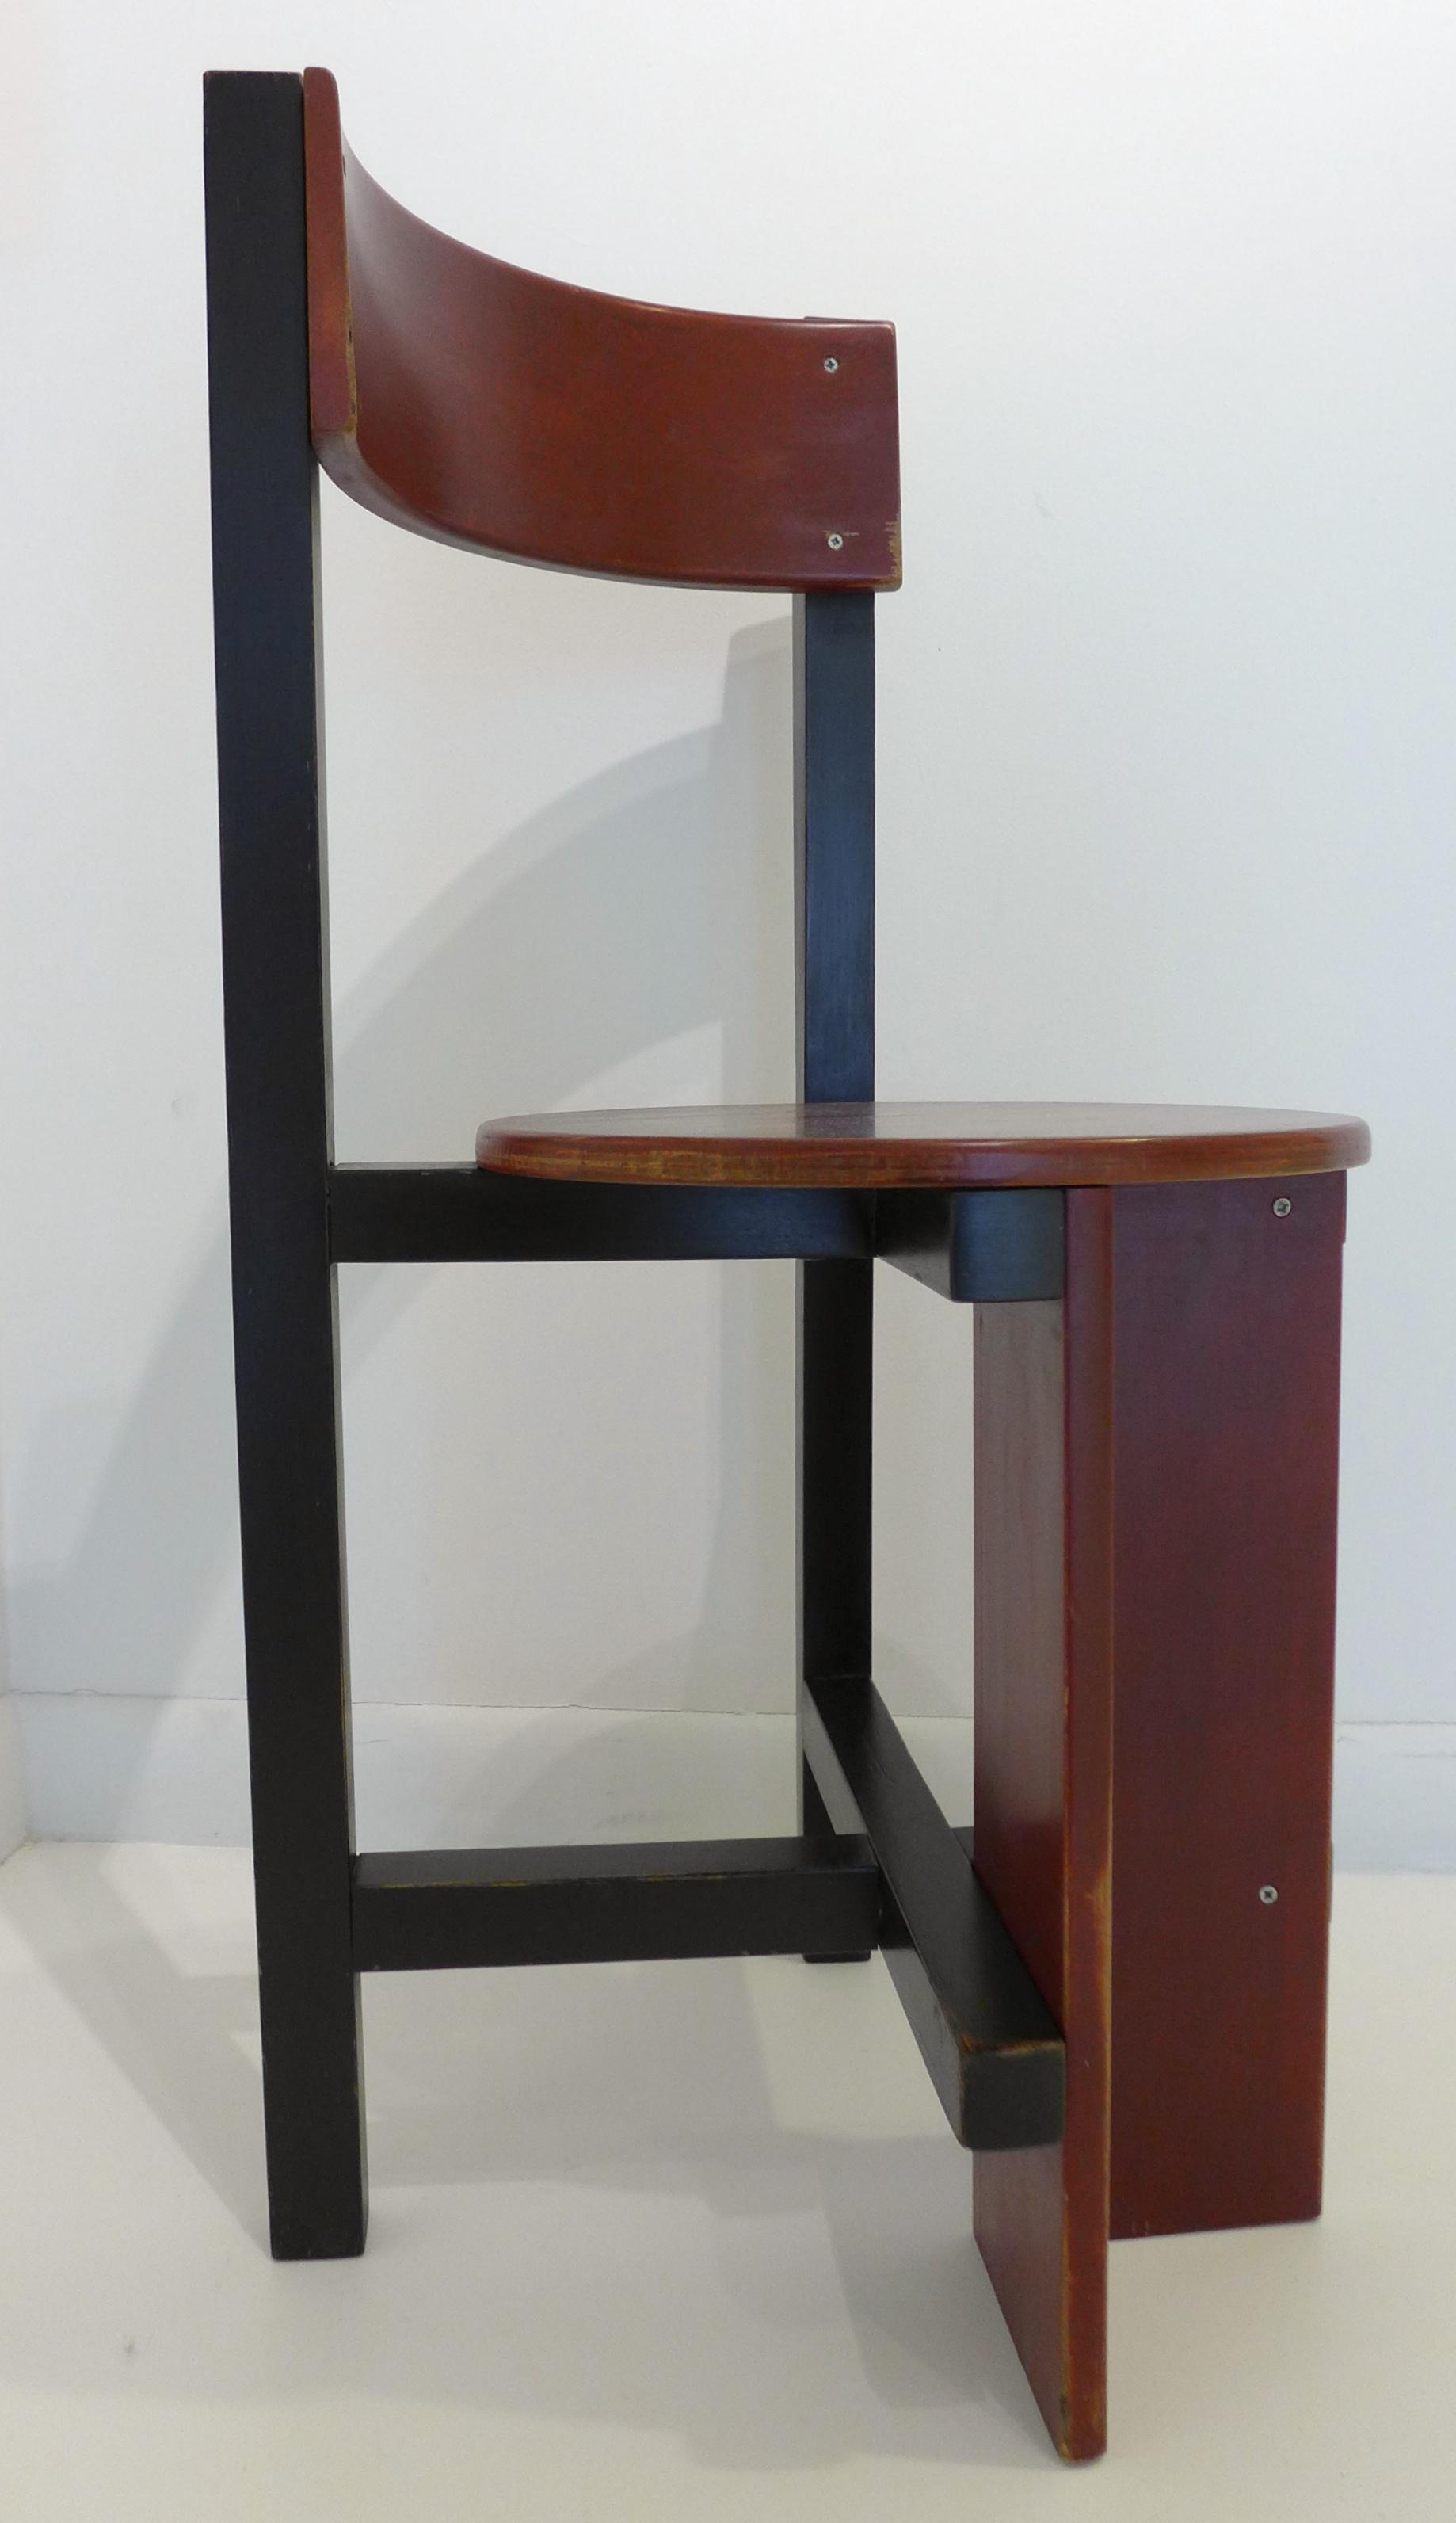 Constructivist Chair  An Homage To De Stijl  By Noted Dutch Architect Piet